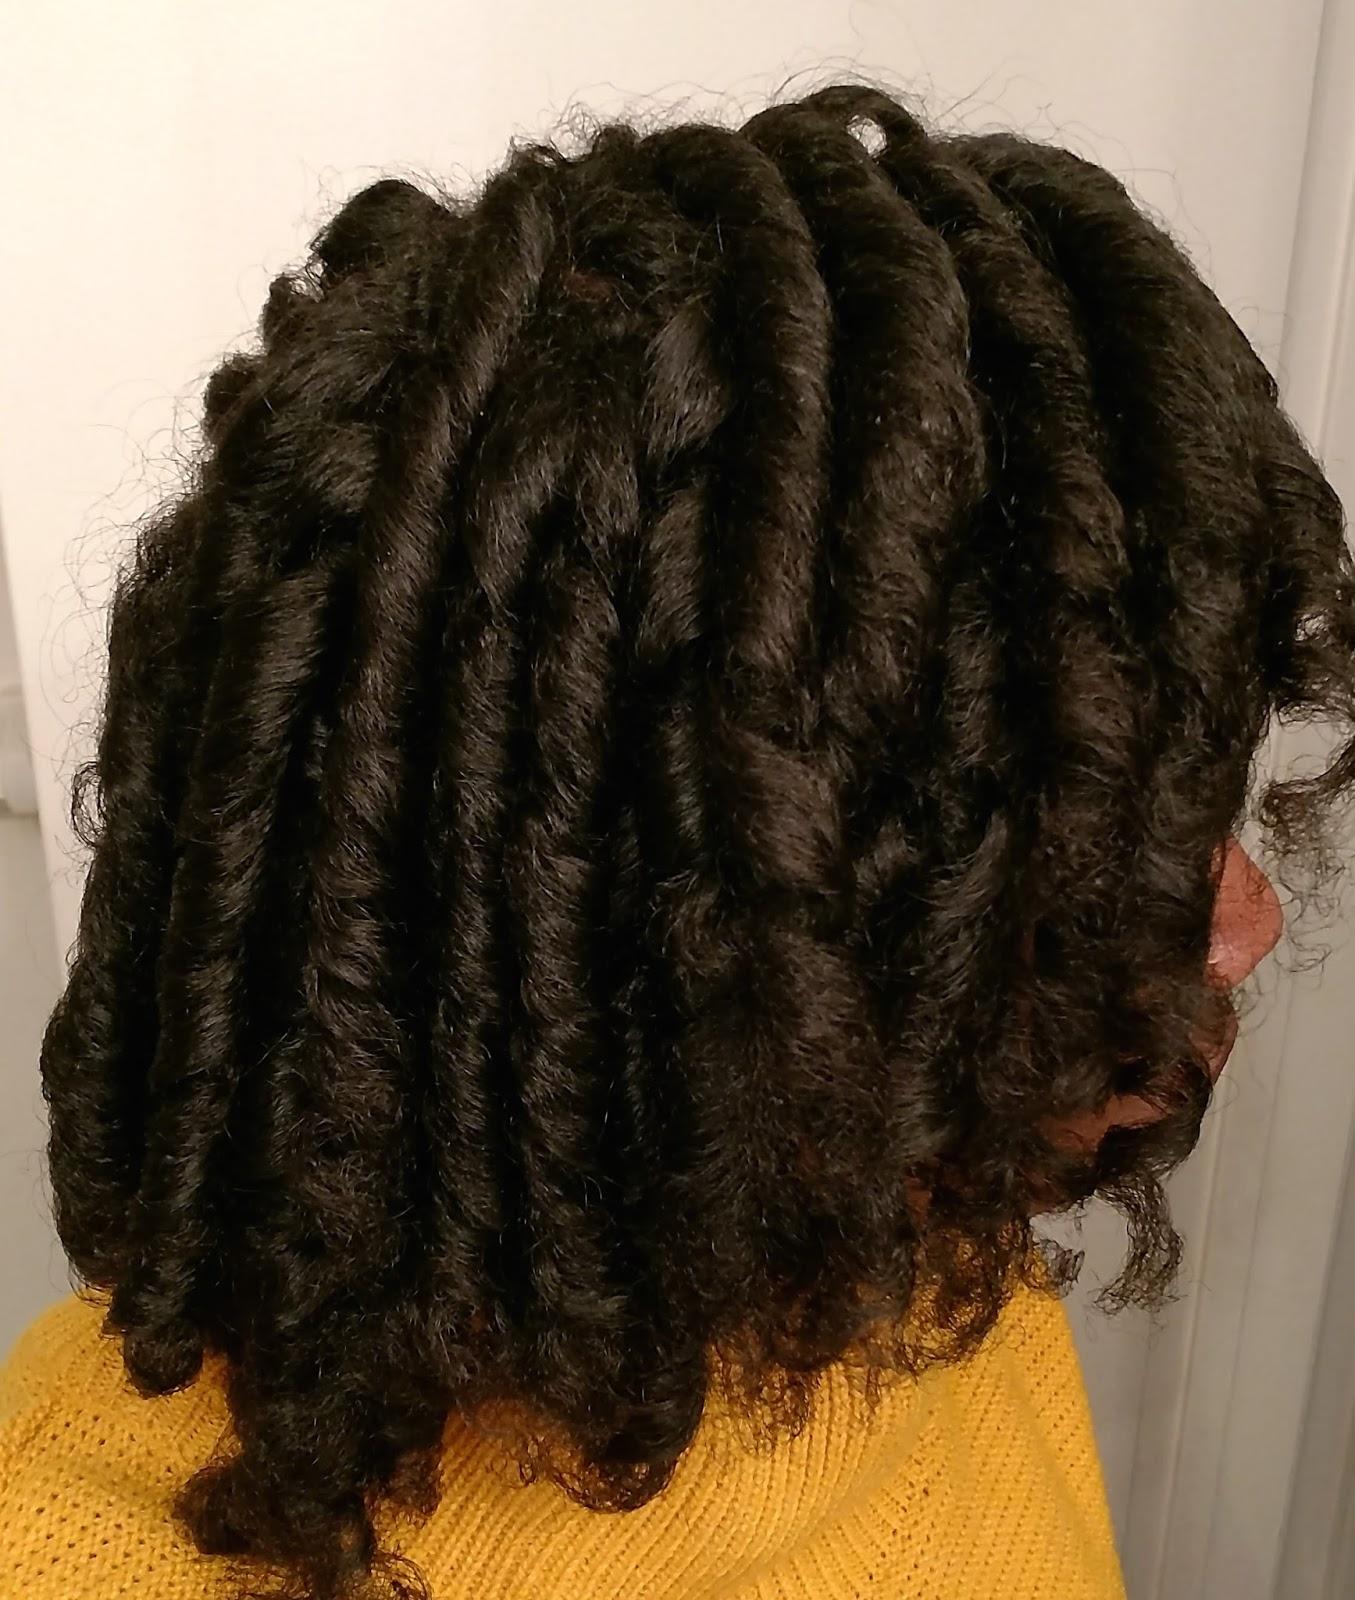 Curlformers On Long Natural Hair Classycurlies Diy Clean Beauty And Healthy Living